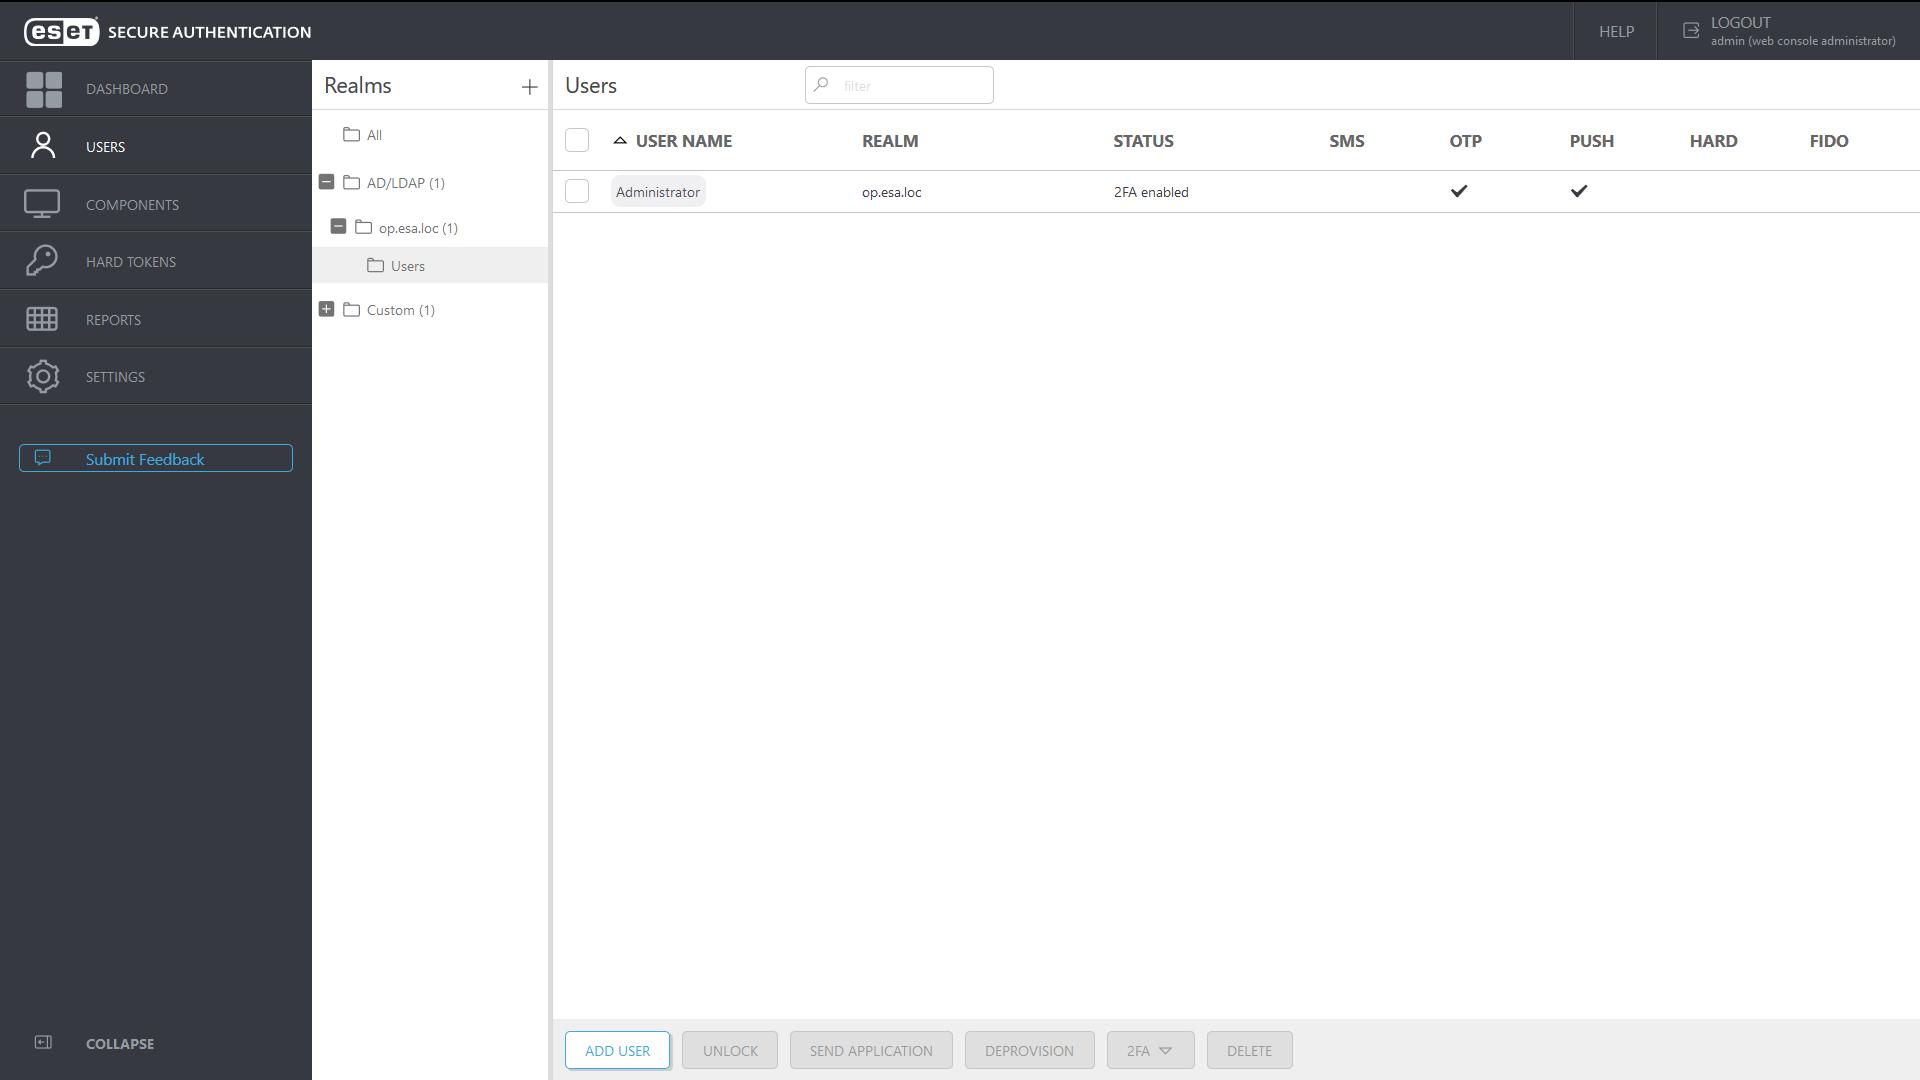 ESET Secure Autentication - Add user